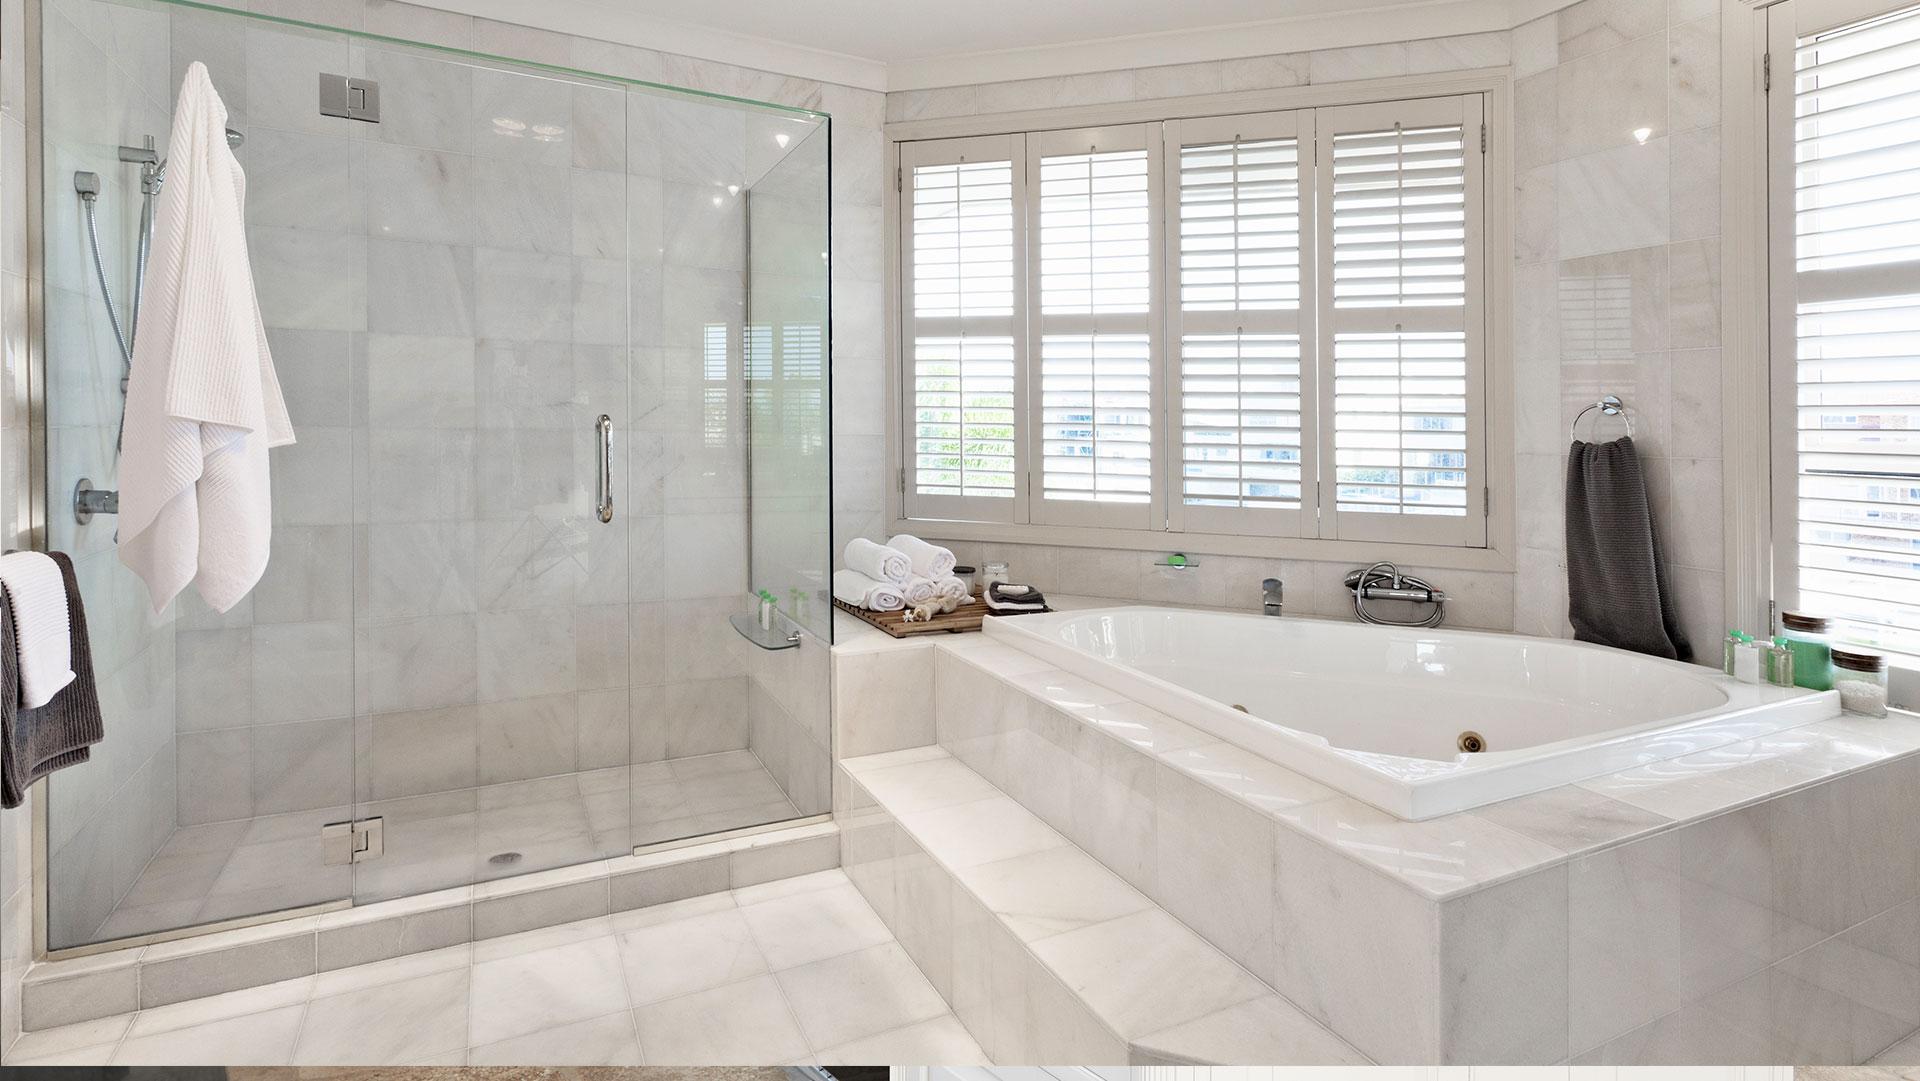 Bathroom Renovation Visualizer home | turlock kitchen remodel, bathroom remodel and granite